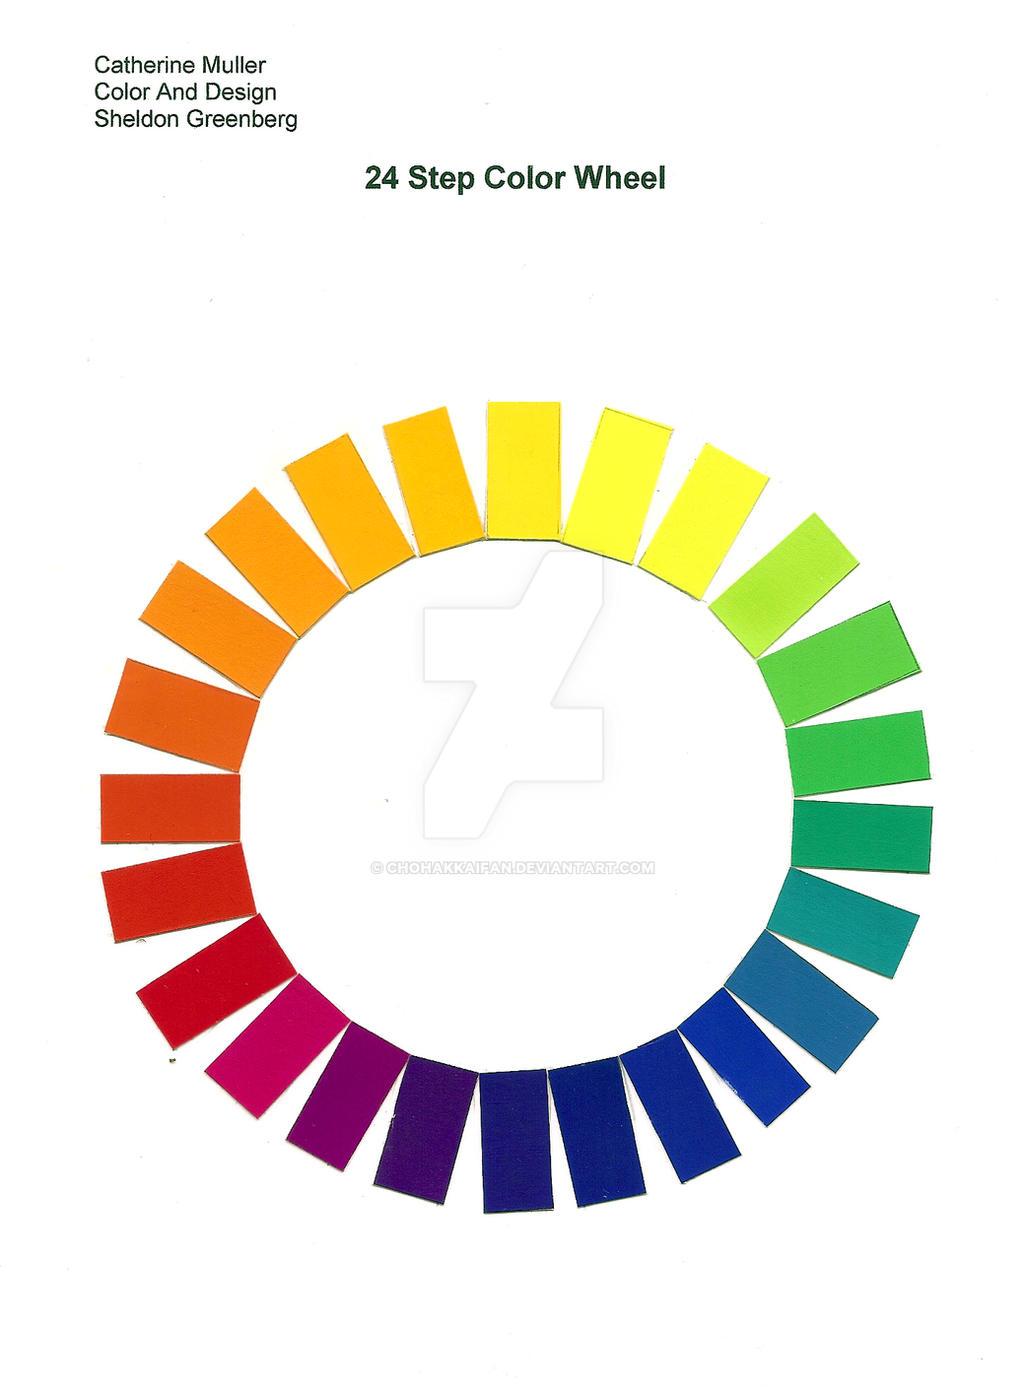 24 Step Color Wheel By ChoHakkaiFan